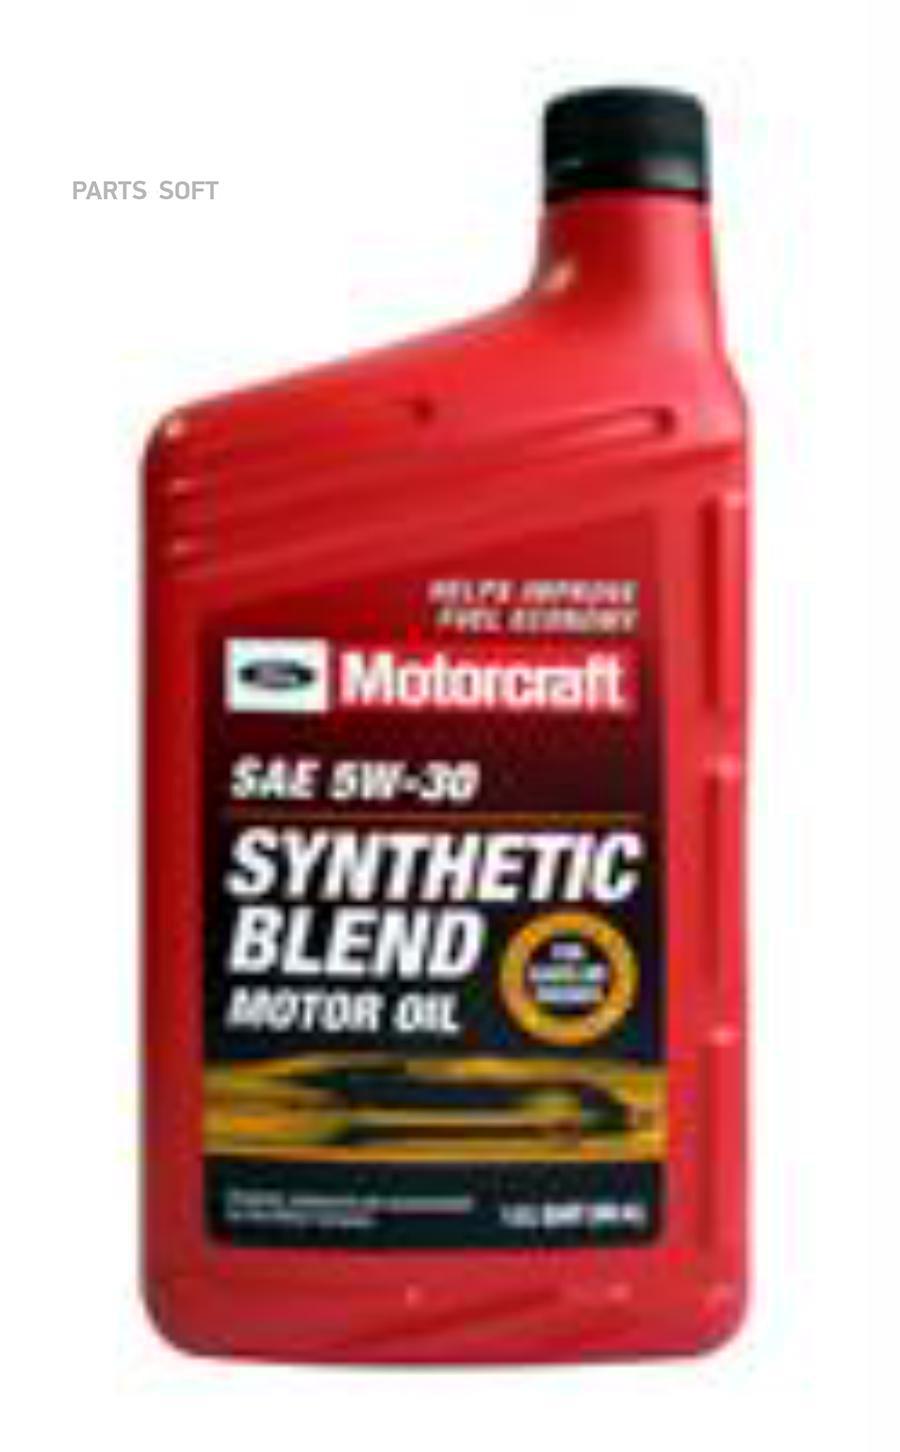 Масло моторное полусинтетическое Synthetic Blend Motor Oil 5W-30, 1л